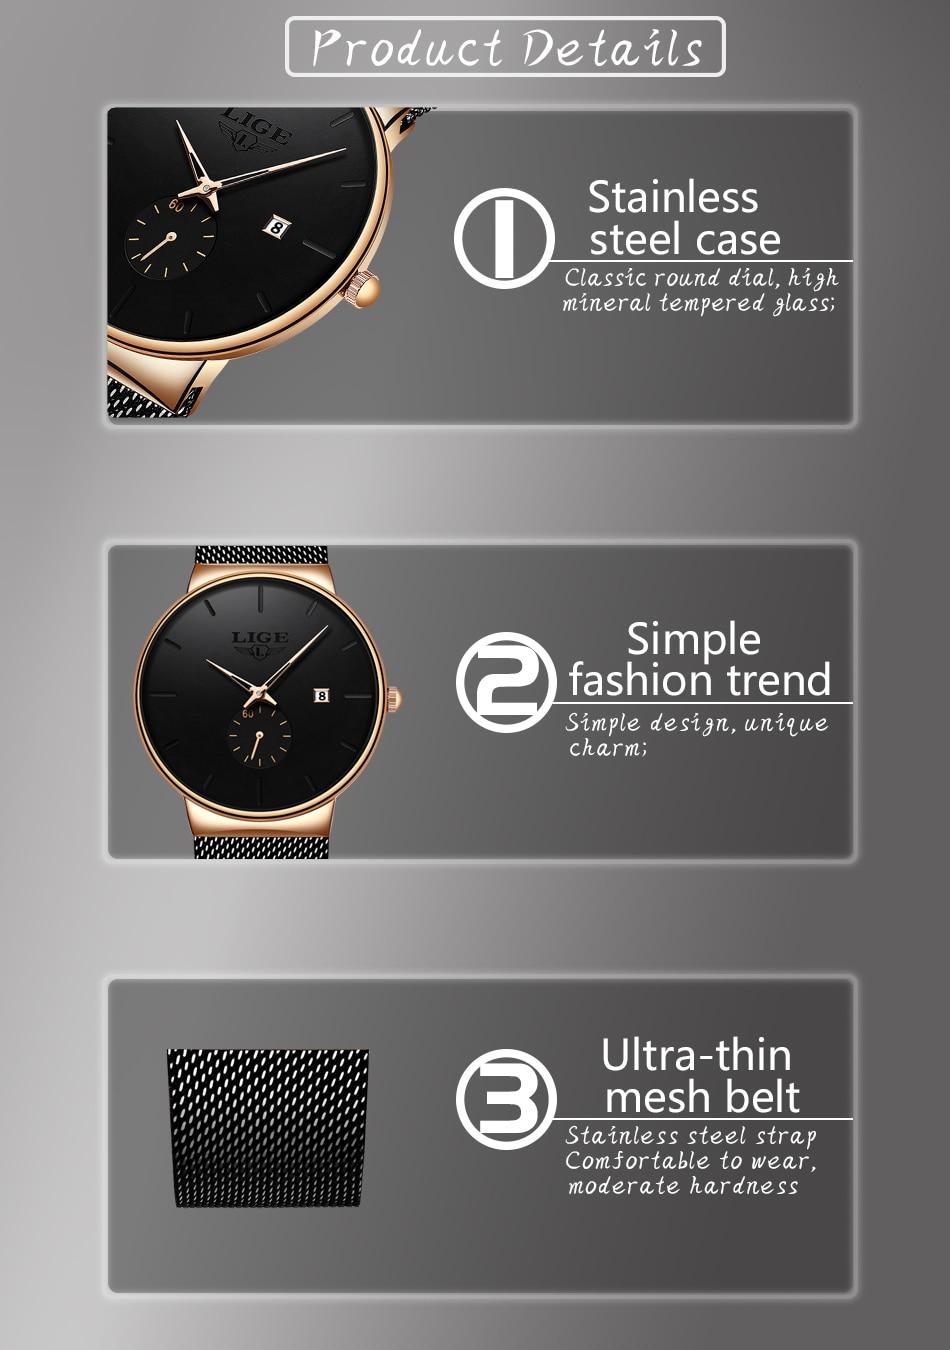 HTB1aV7ue8Gw3KVjSZFwq6zQ2FXau Relojes Hombre LIGE New Mesh Steel Men Watches Top Brand Luxury Ultra-thin Waterproof Quartz Watch Men Casual Sport Quartz Clock